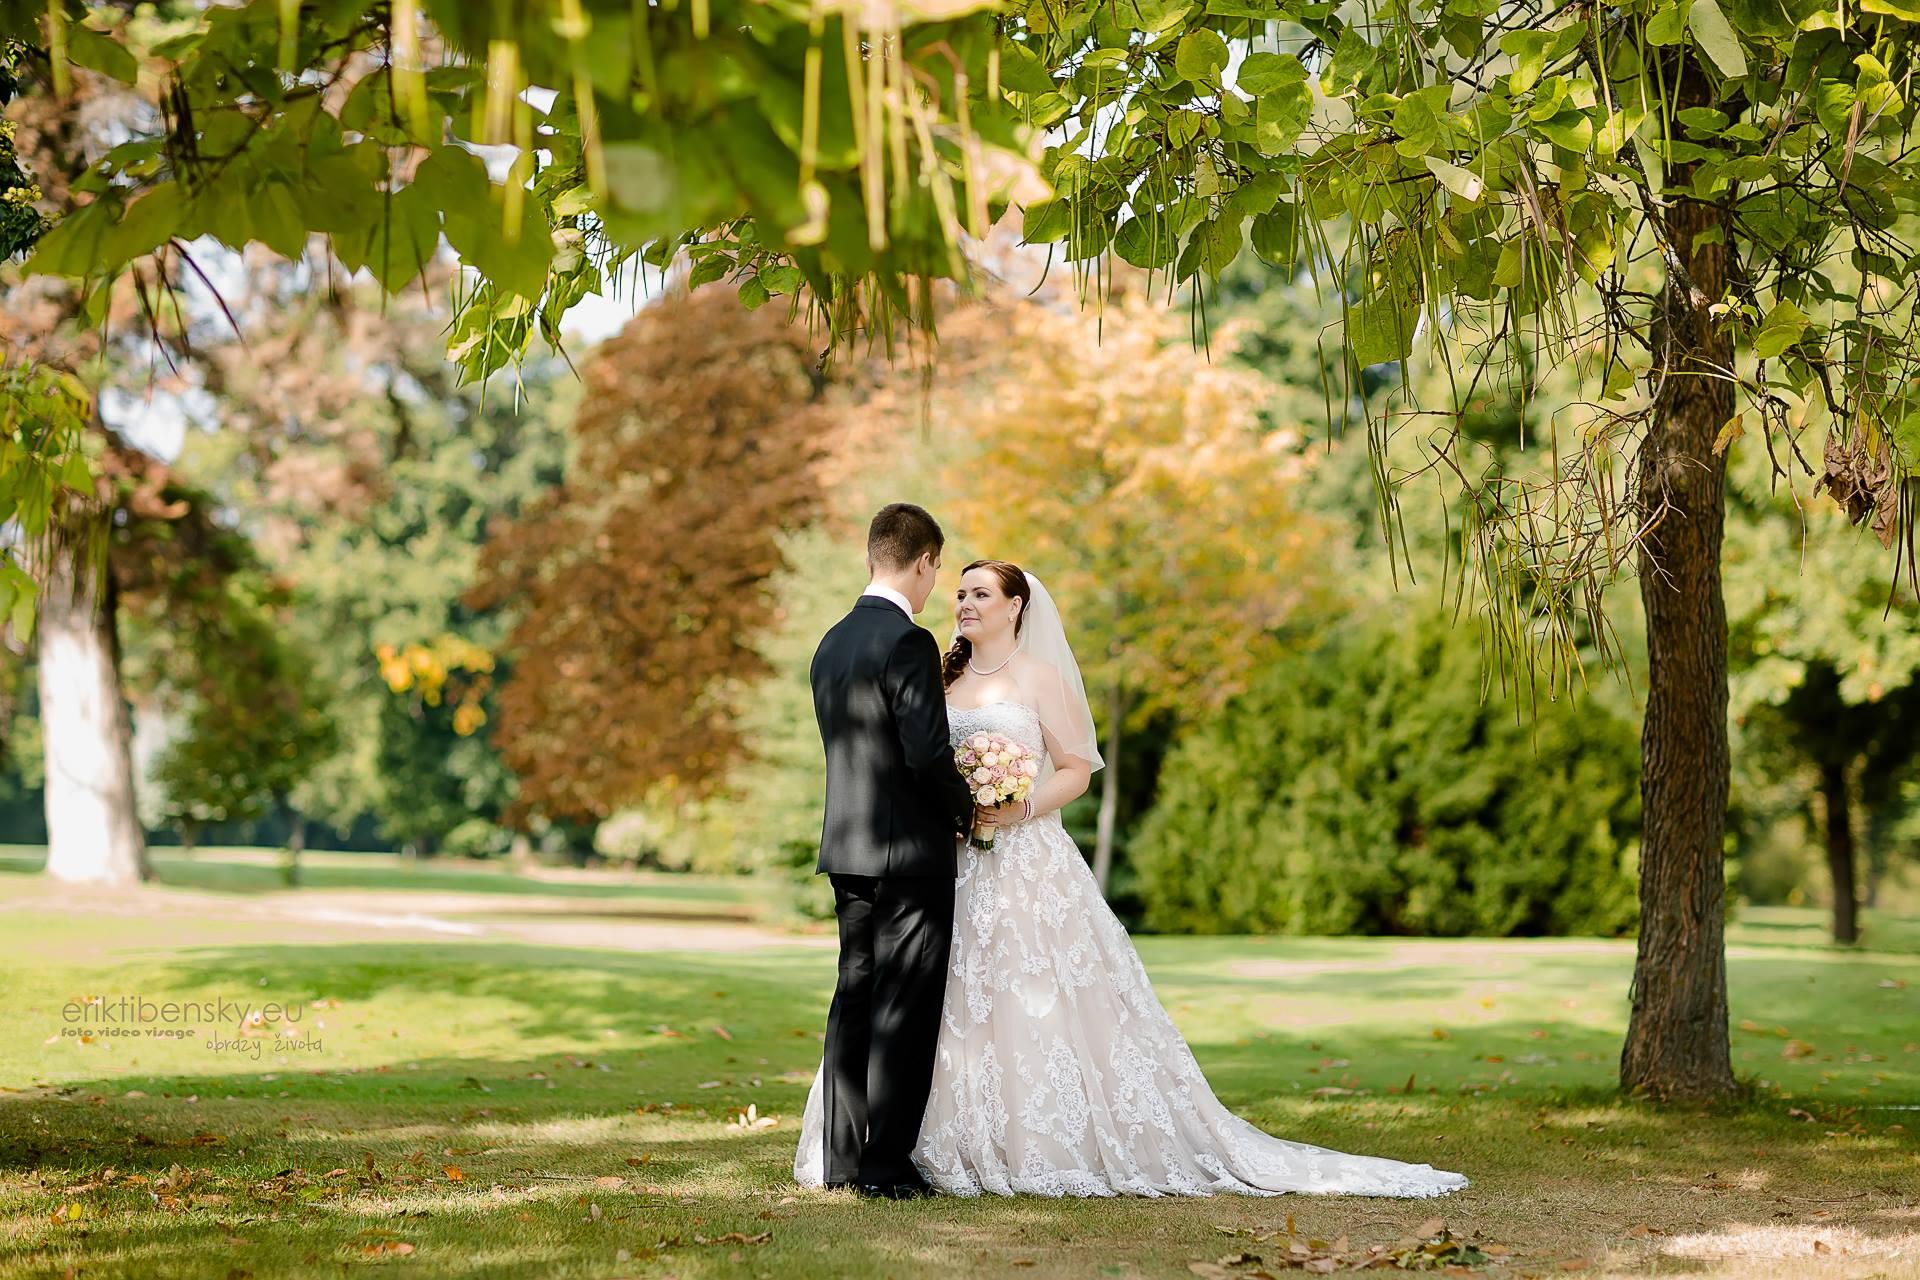 eriktibensky-eu-svadobny-fotograf-wedding-photographer-3079